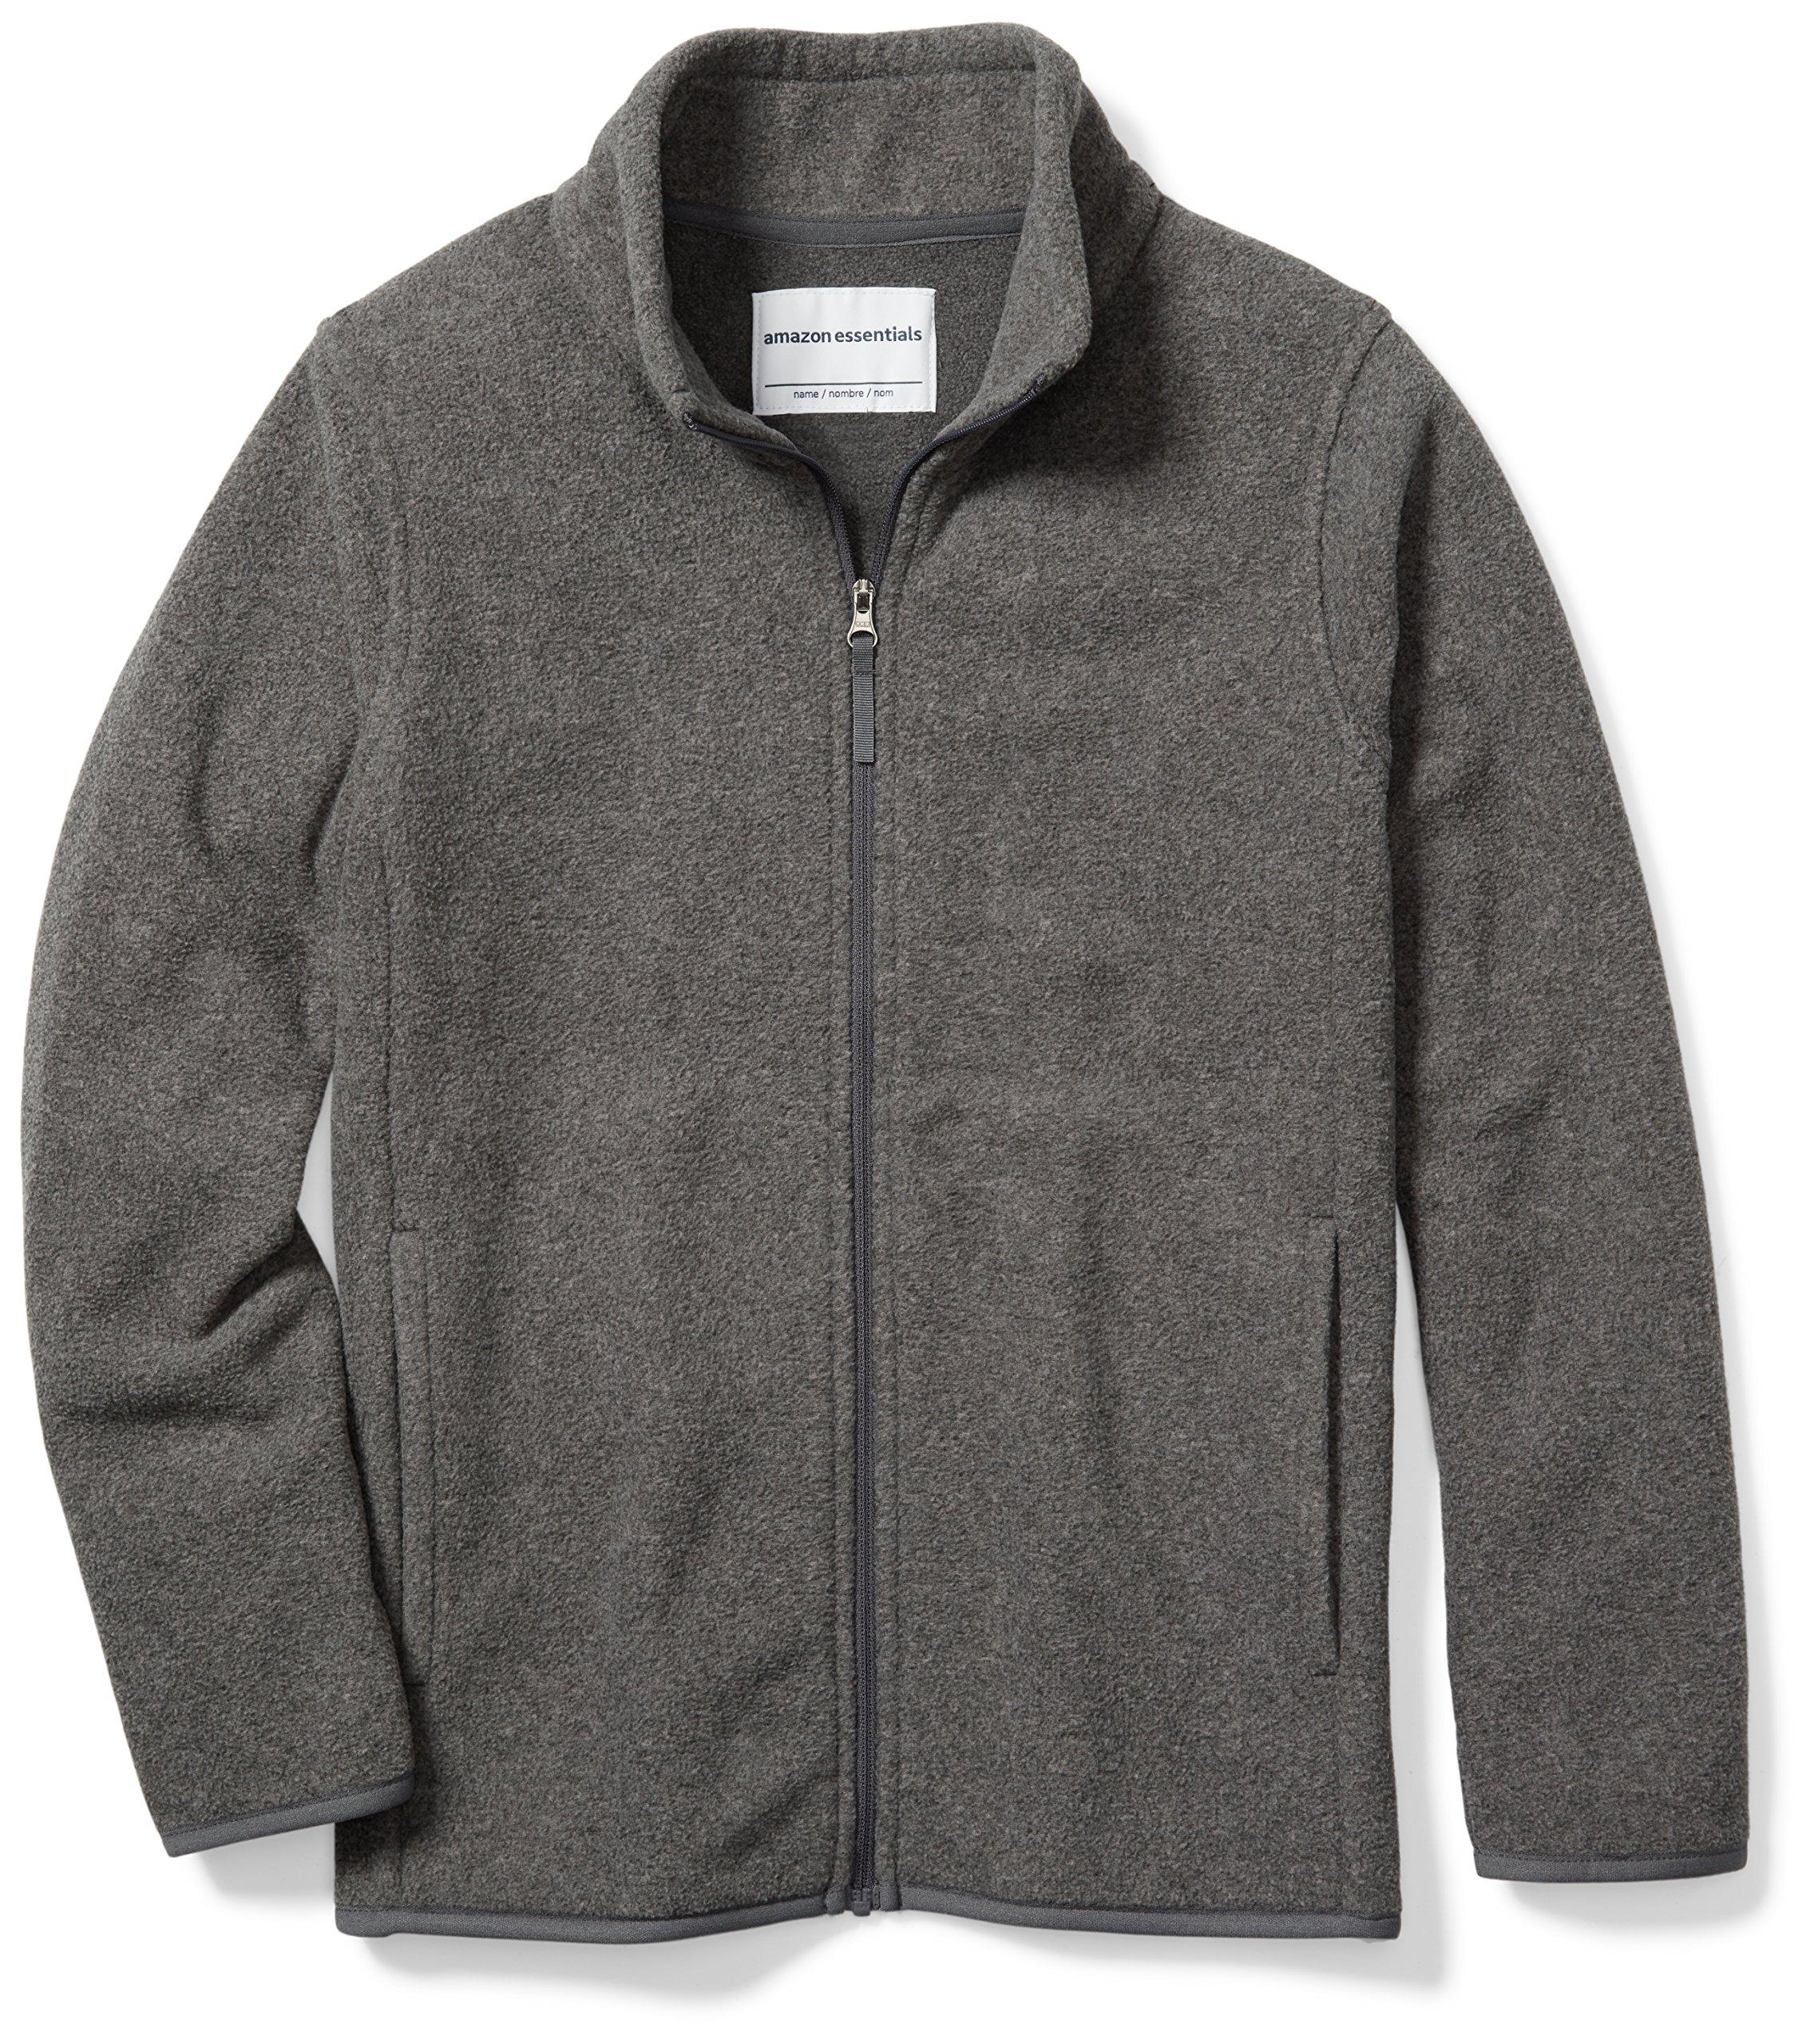 Amazon Essentials Boys' Full-Zip Polar Fleece Jacket, Grey Charcoal Heather, Medium by Amazon Essentials